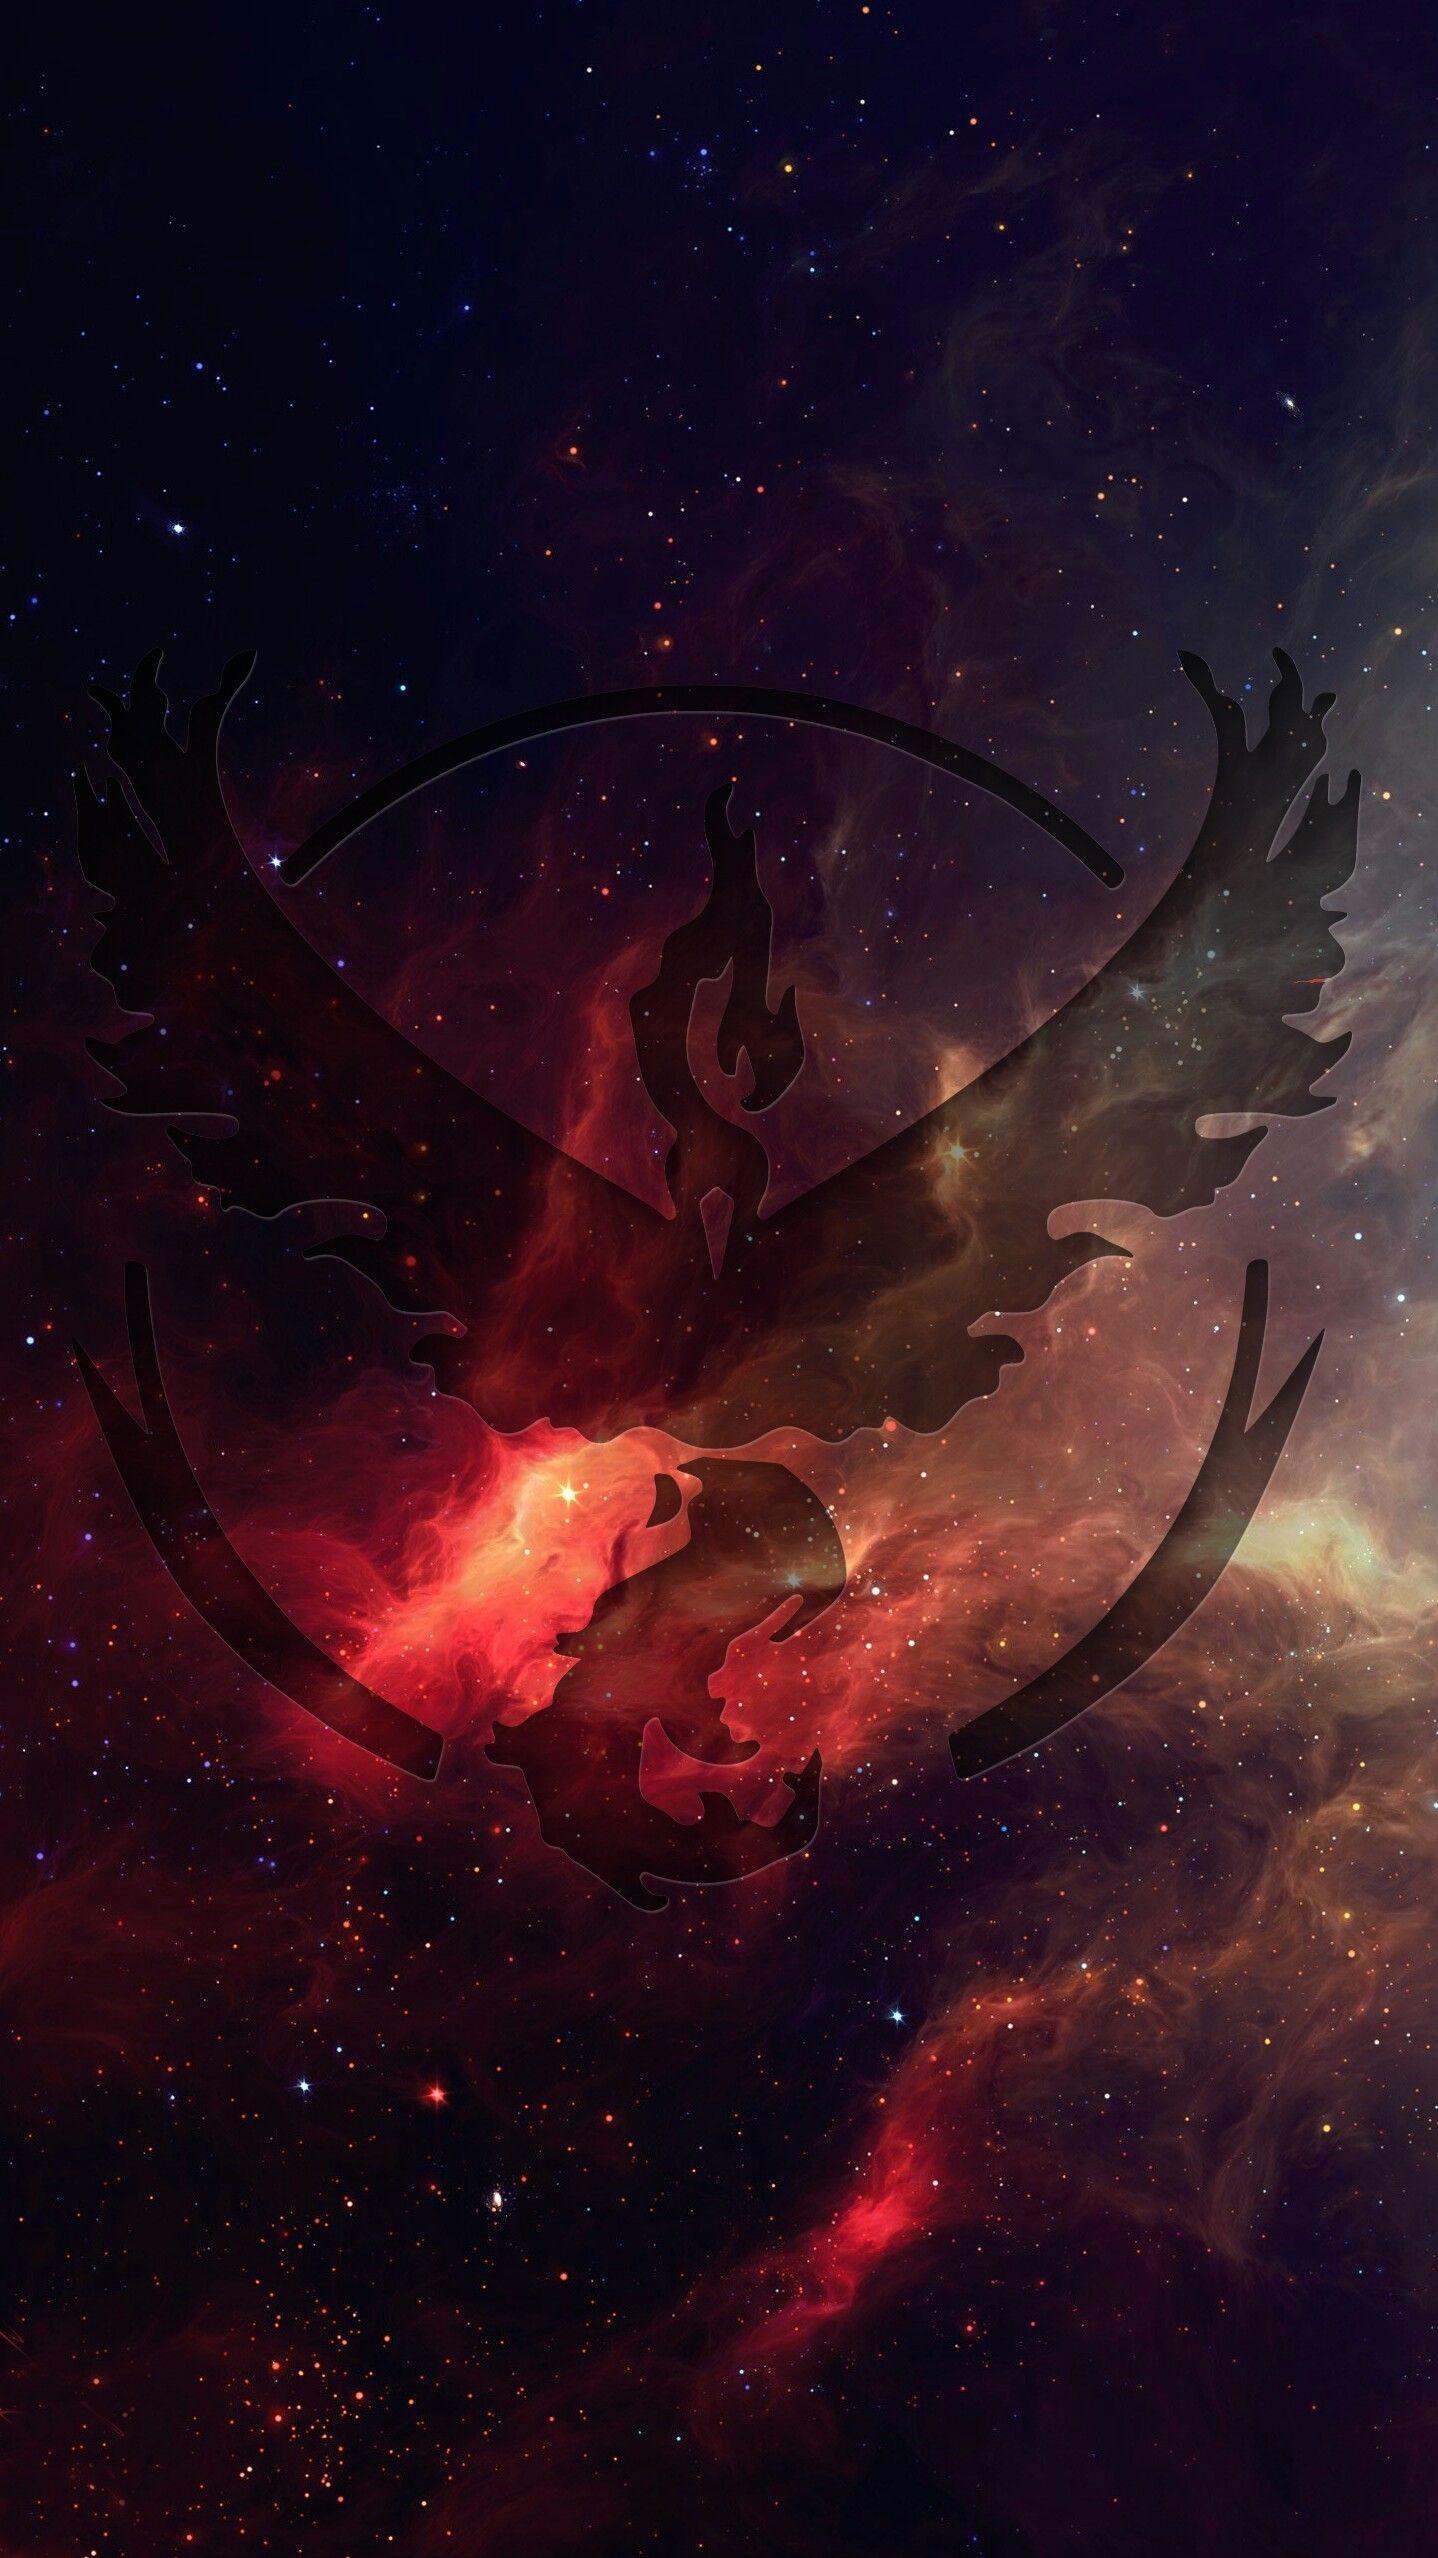 Team Valor phone wallpaper by Dougery on Imgur Pokemon